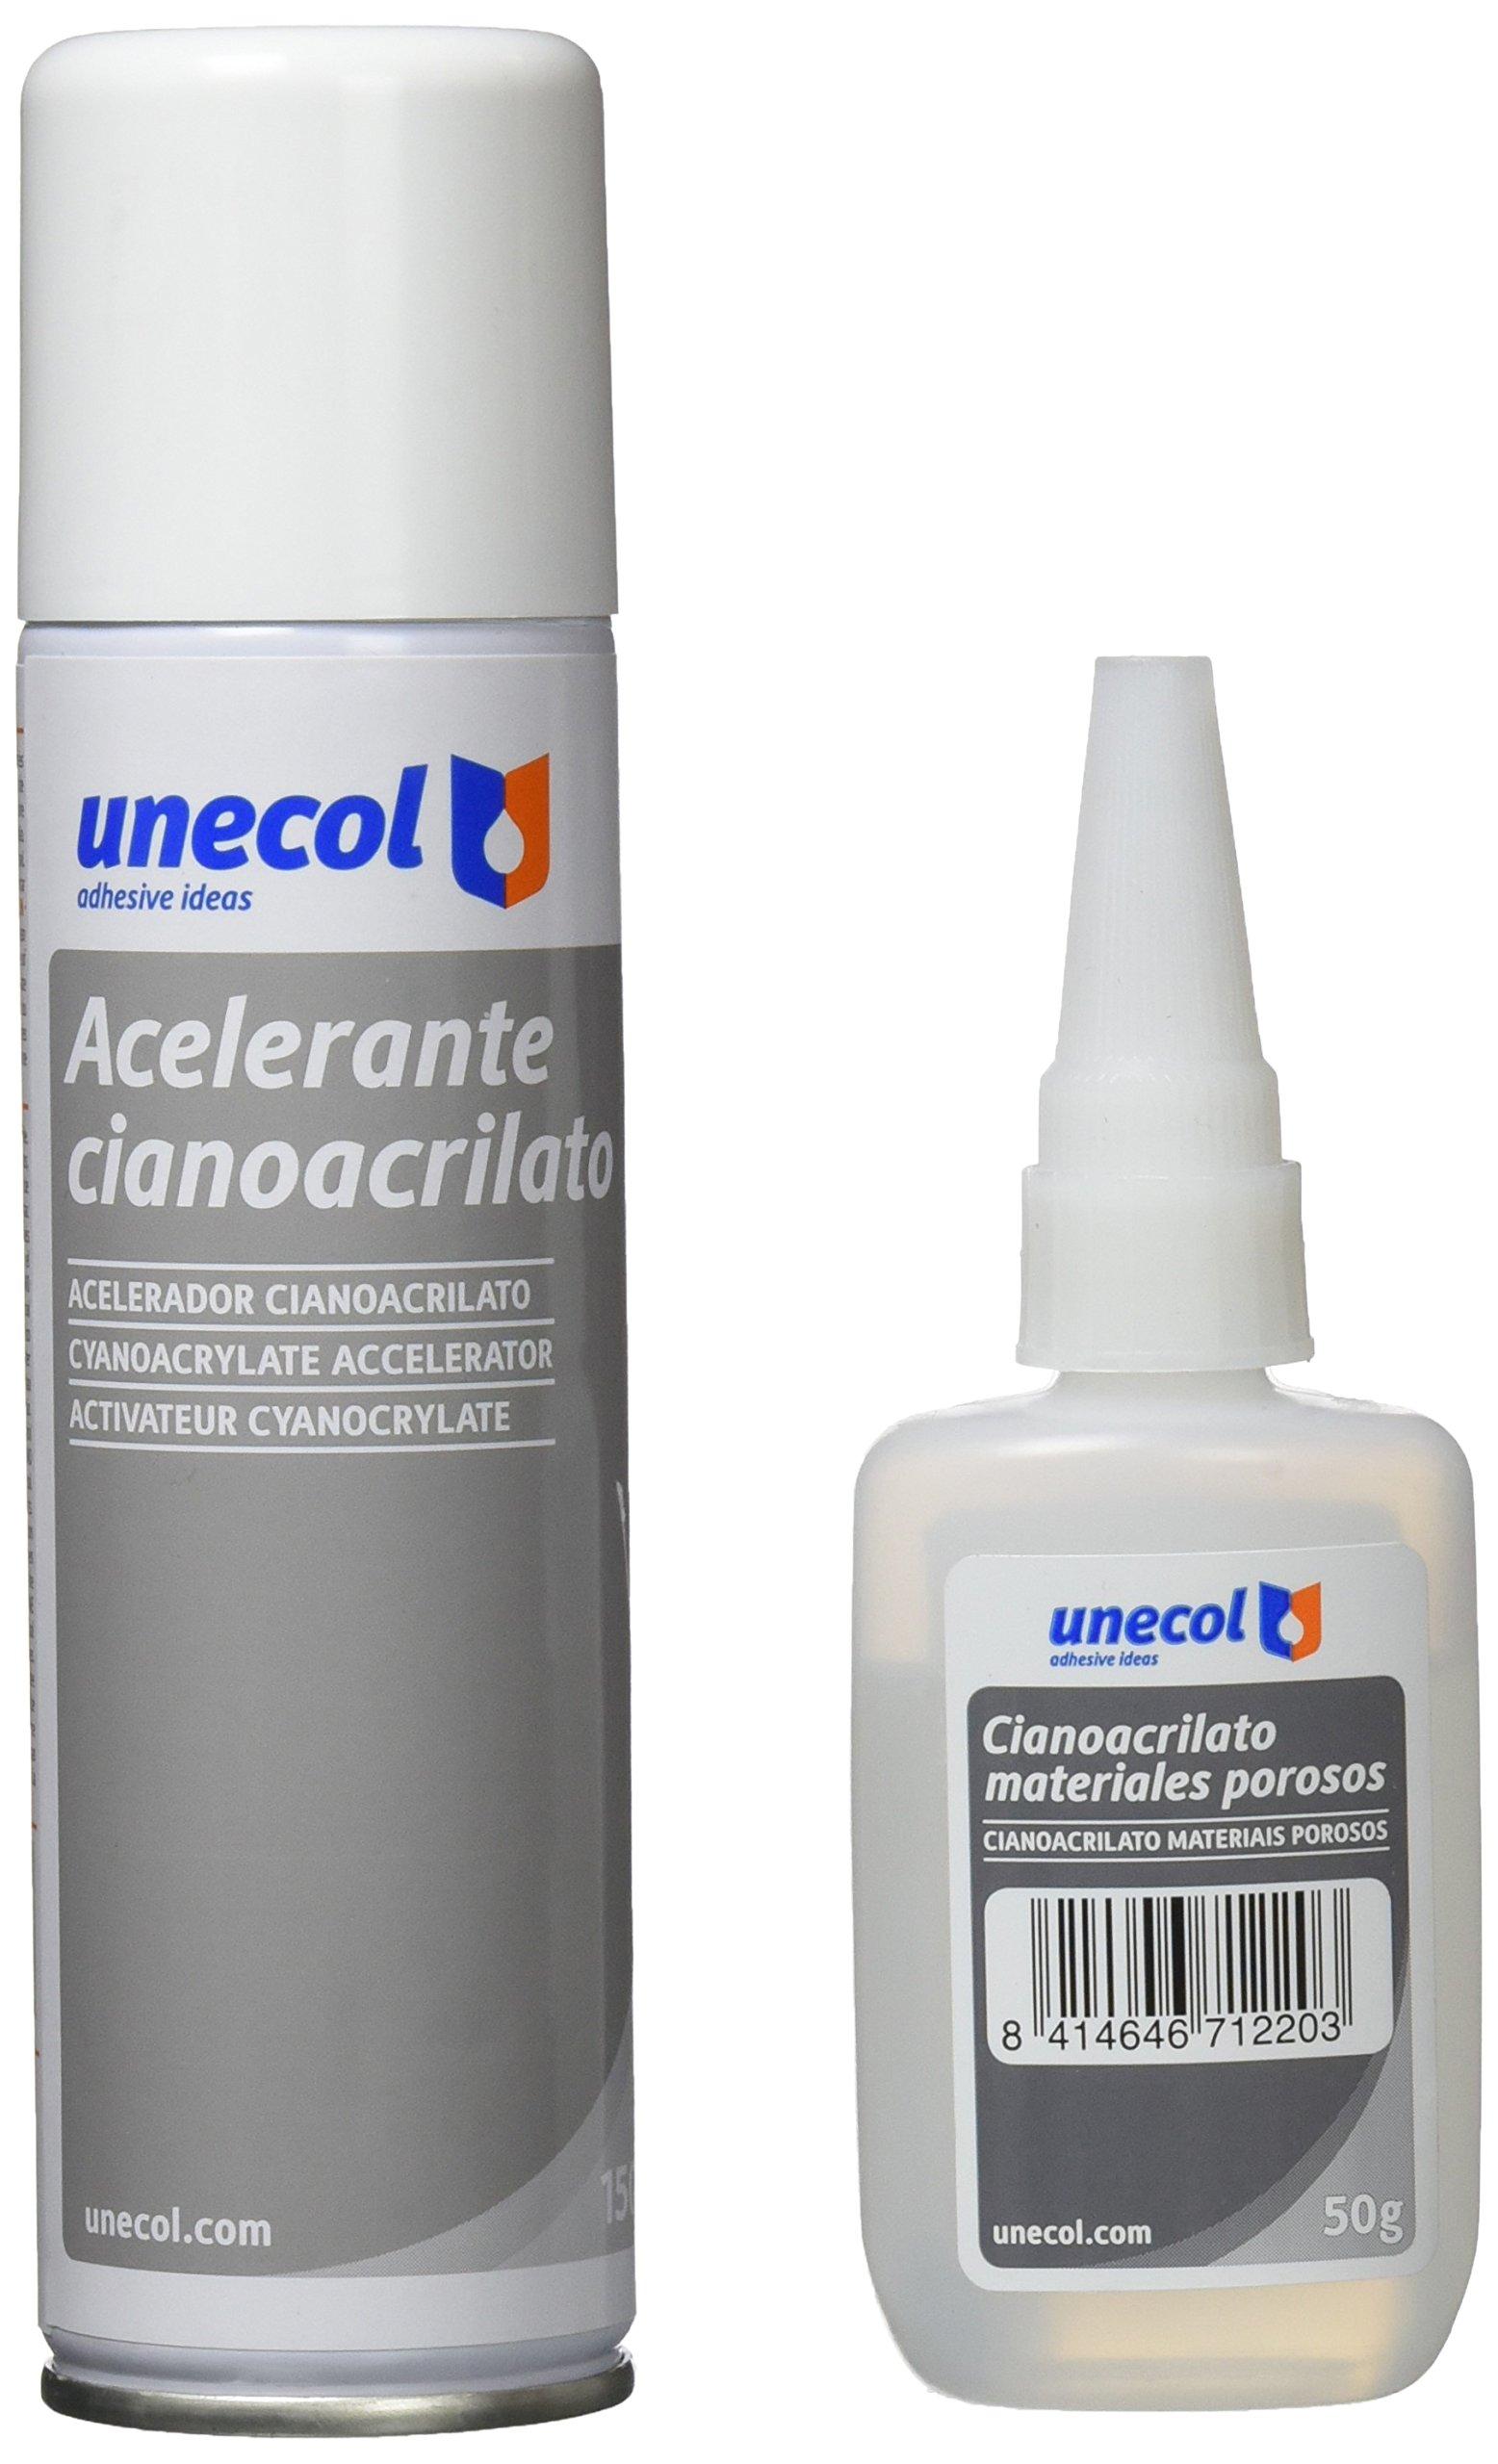 Unecol 7156 Kit accelerante + ciano para materiales porosos (botella) Transparente 50 g +